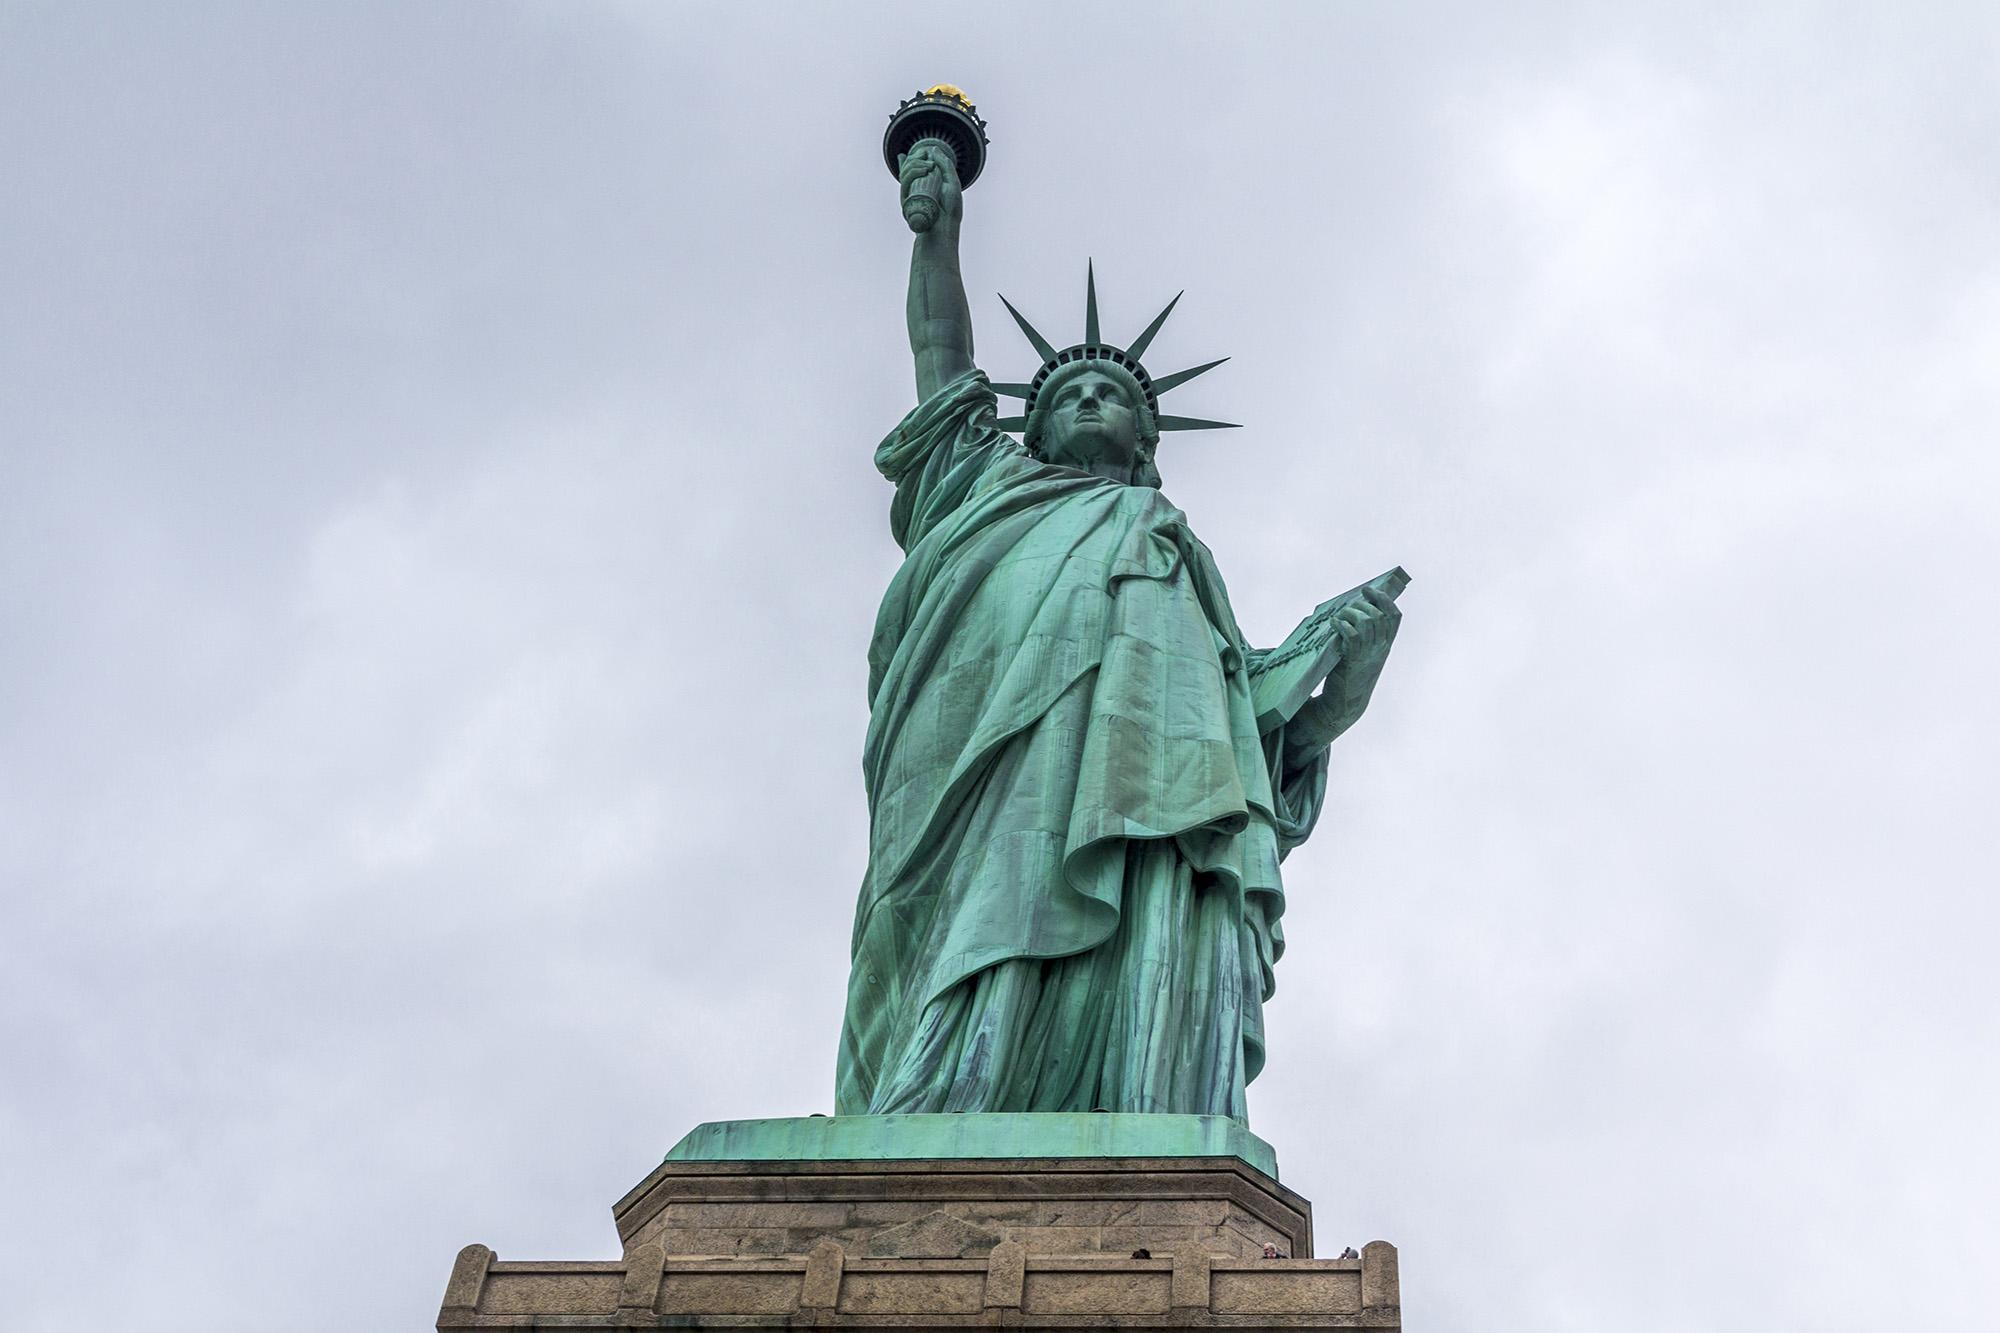 Statue of Liberty à New York